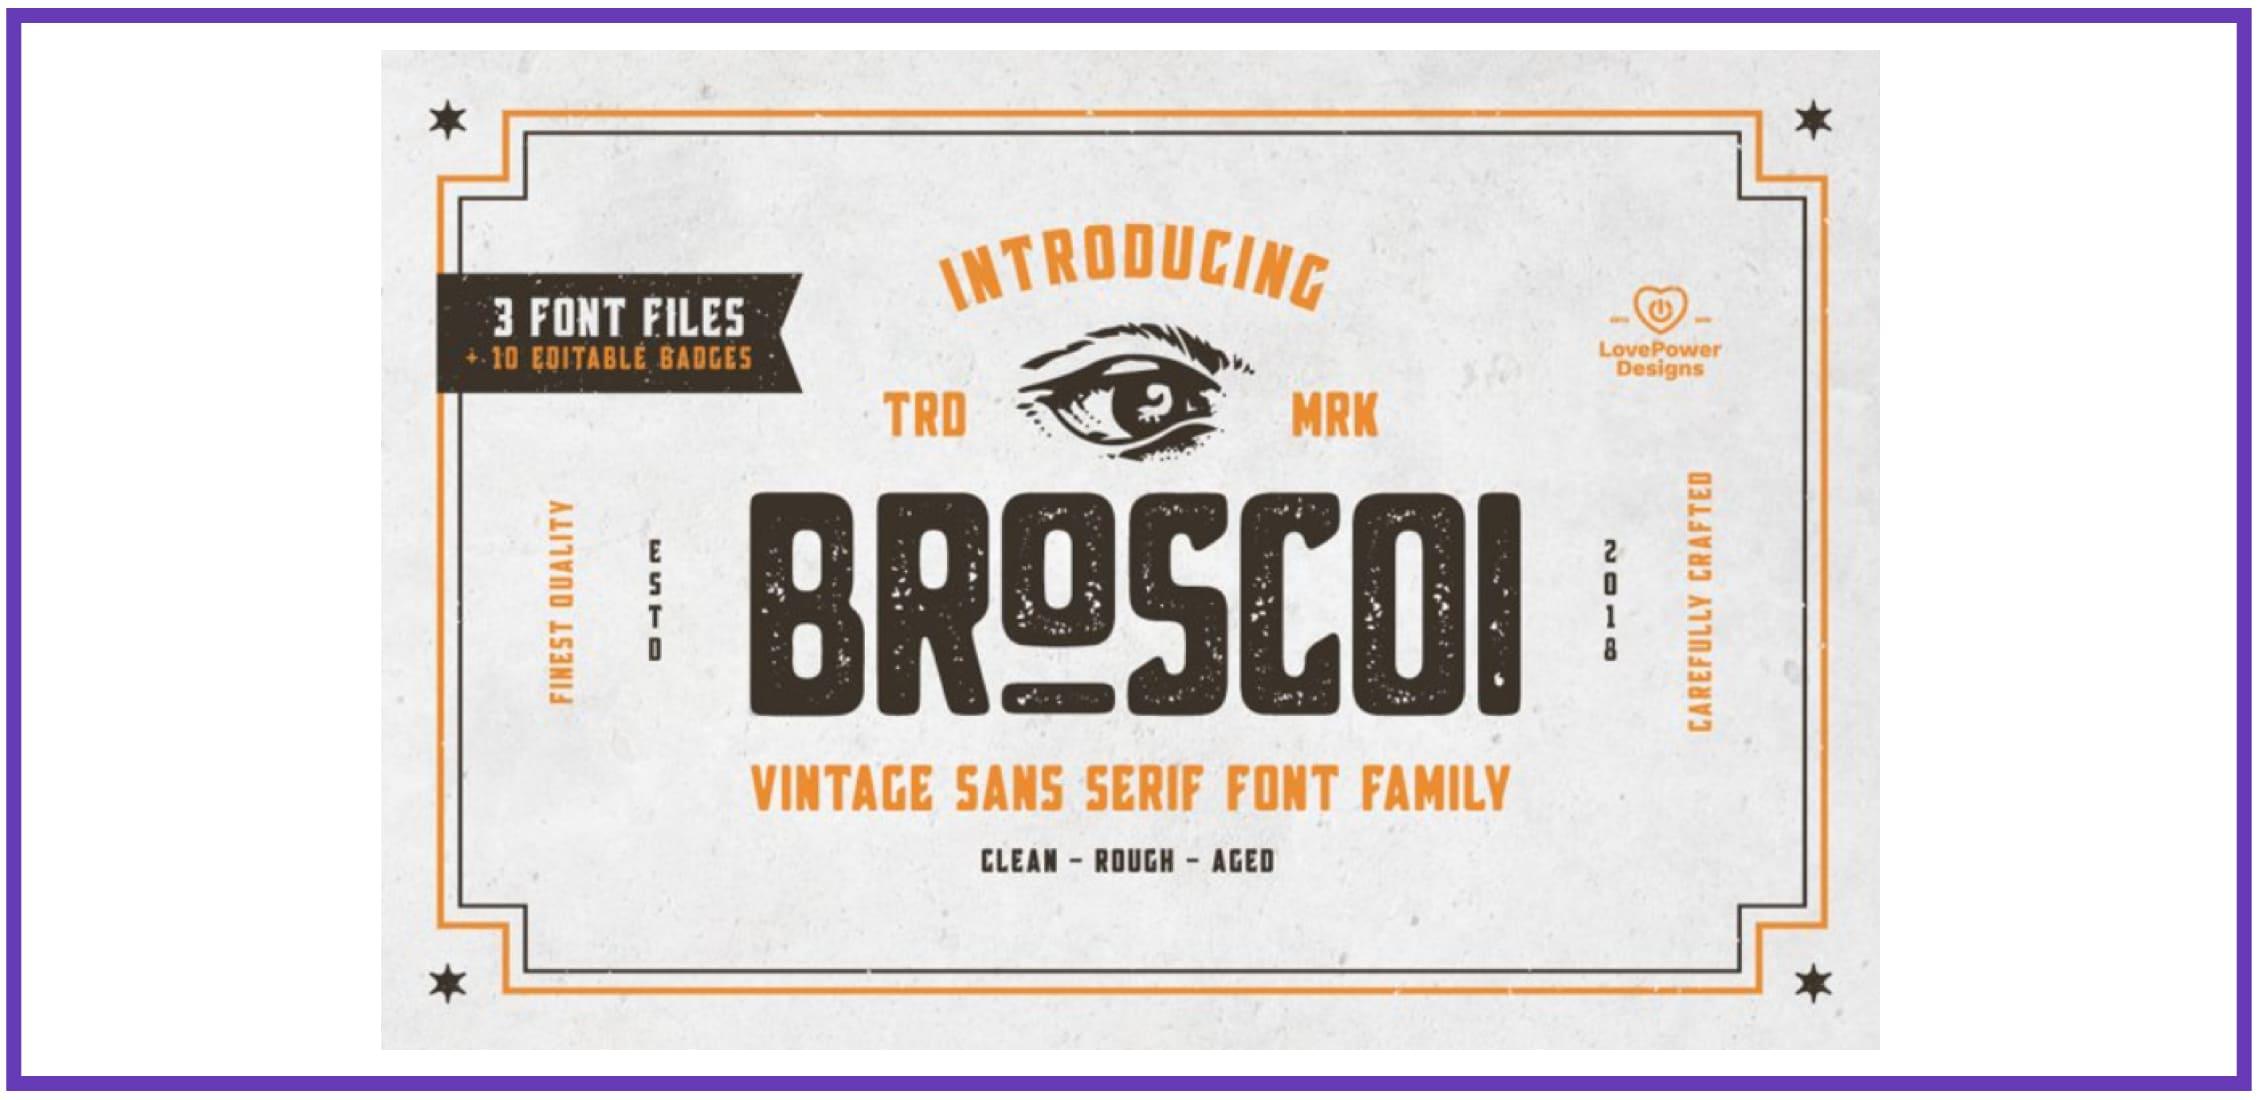 Broscoi - Vintage Font Family. Best Industrial Fonts.